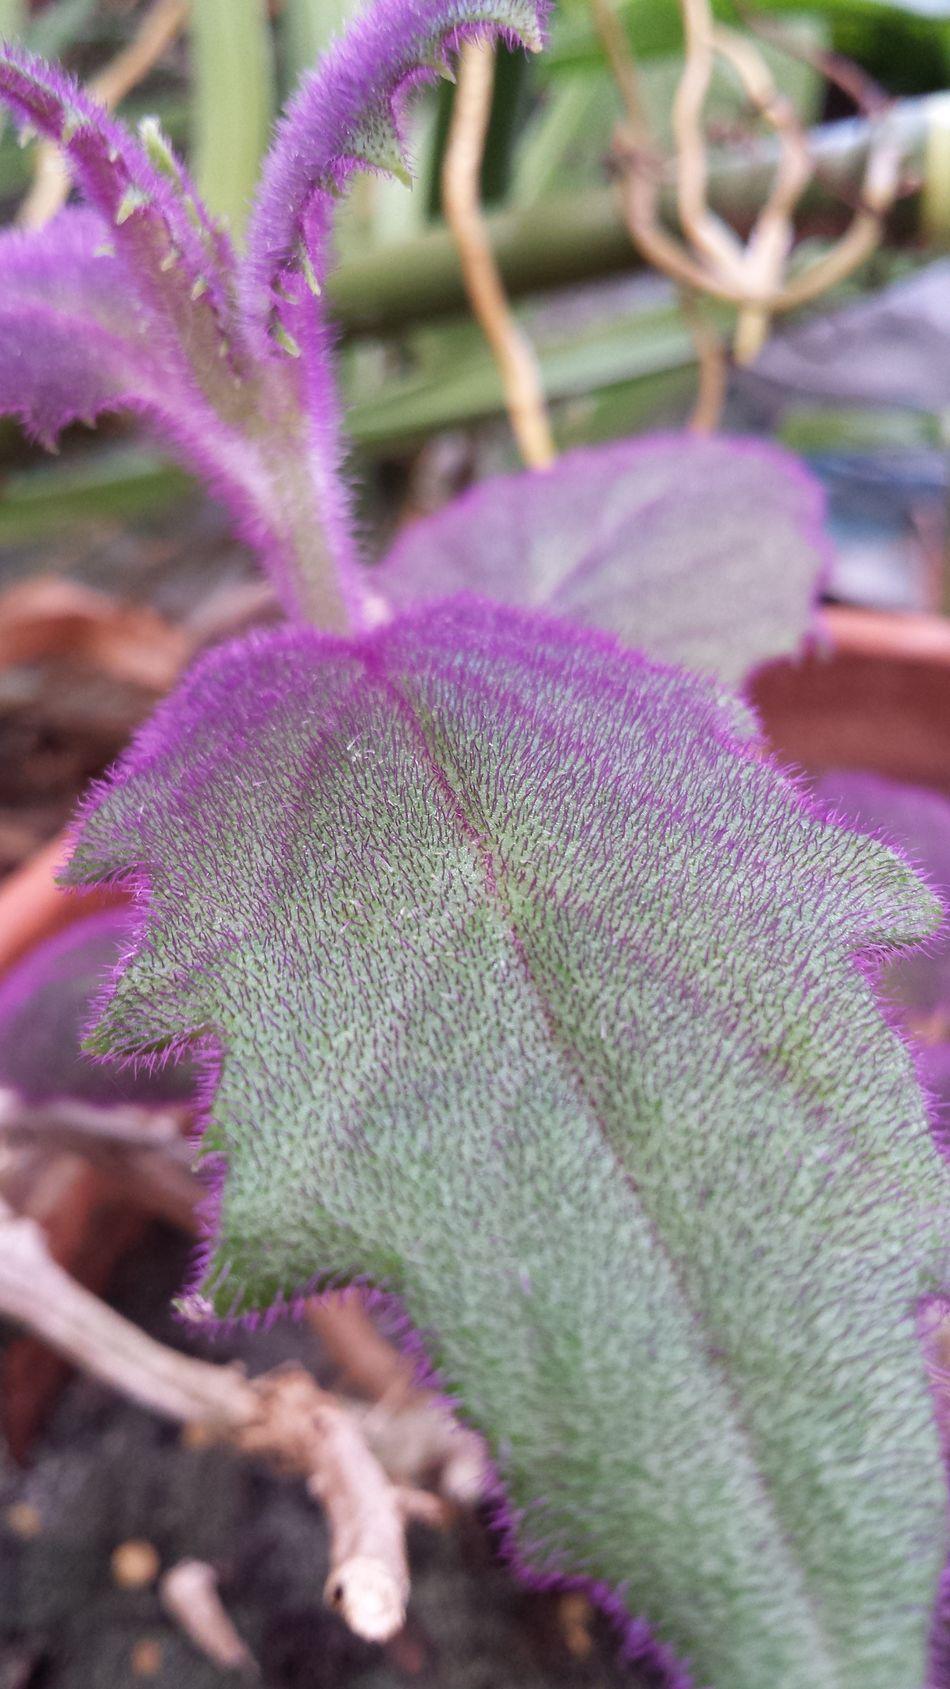 The Purist (no Edit, No Filter) Purple Hair Leaf Hairy Leaves Beautiful My Yard  Nature Backyard Beauty